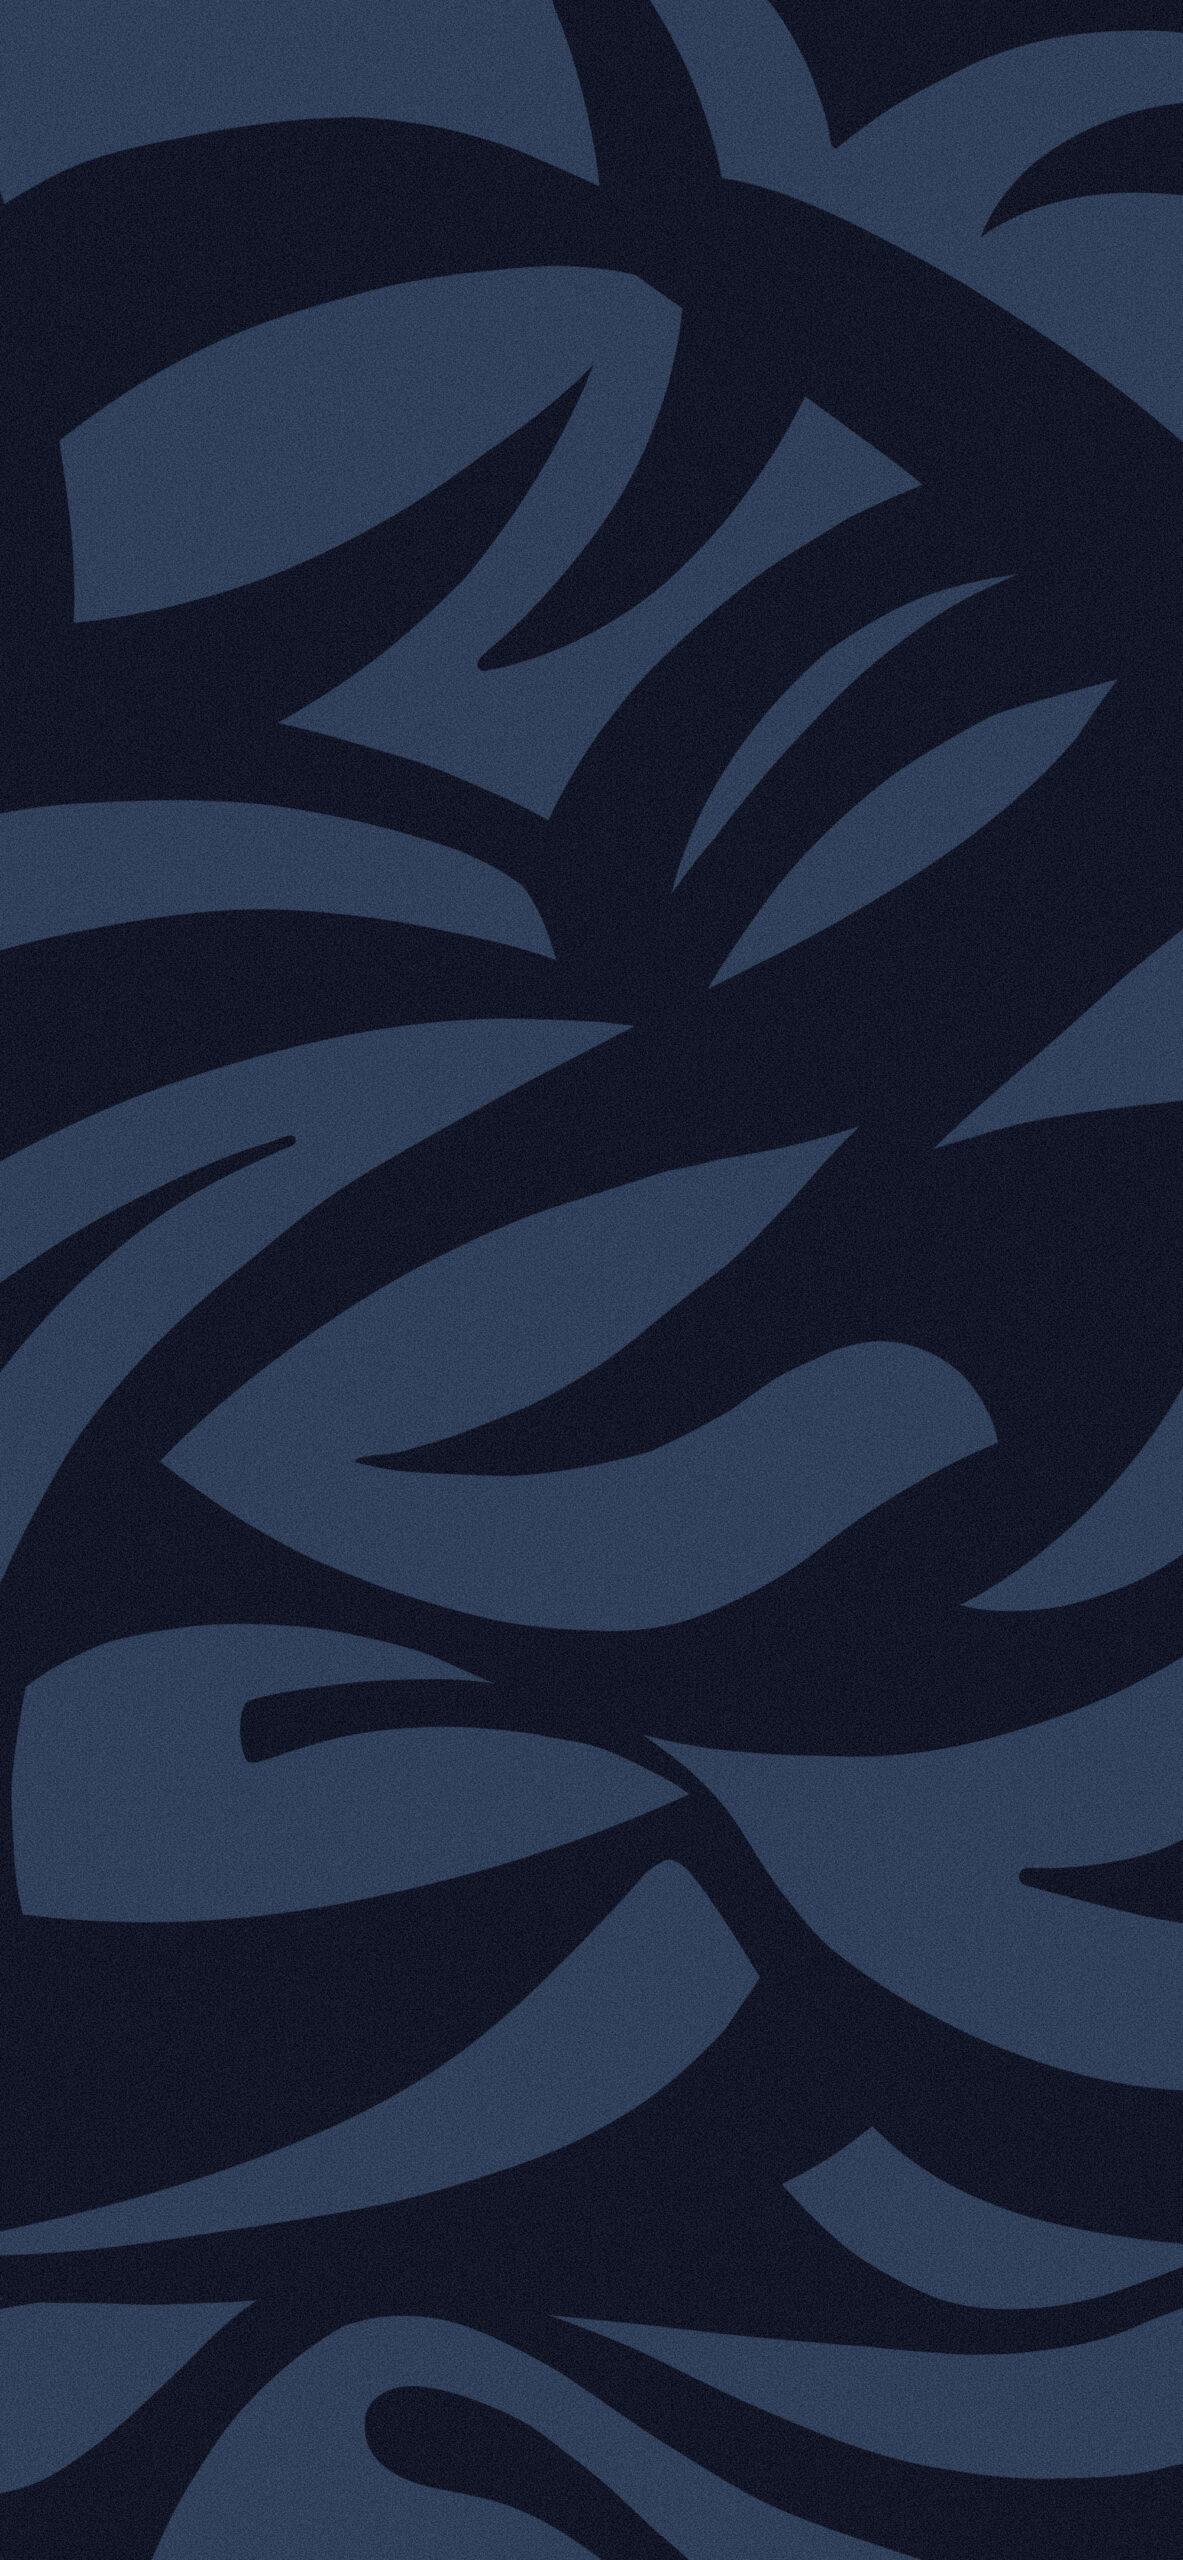 demon slayer inosuke hashibira blue background